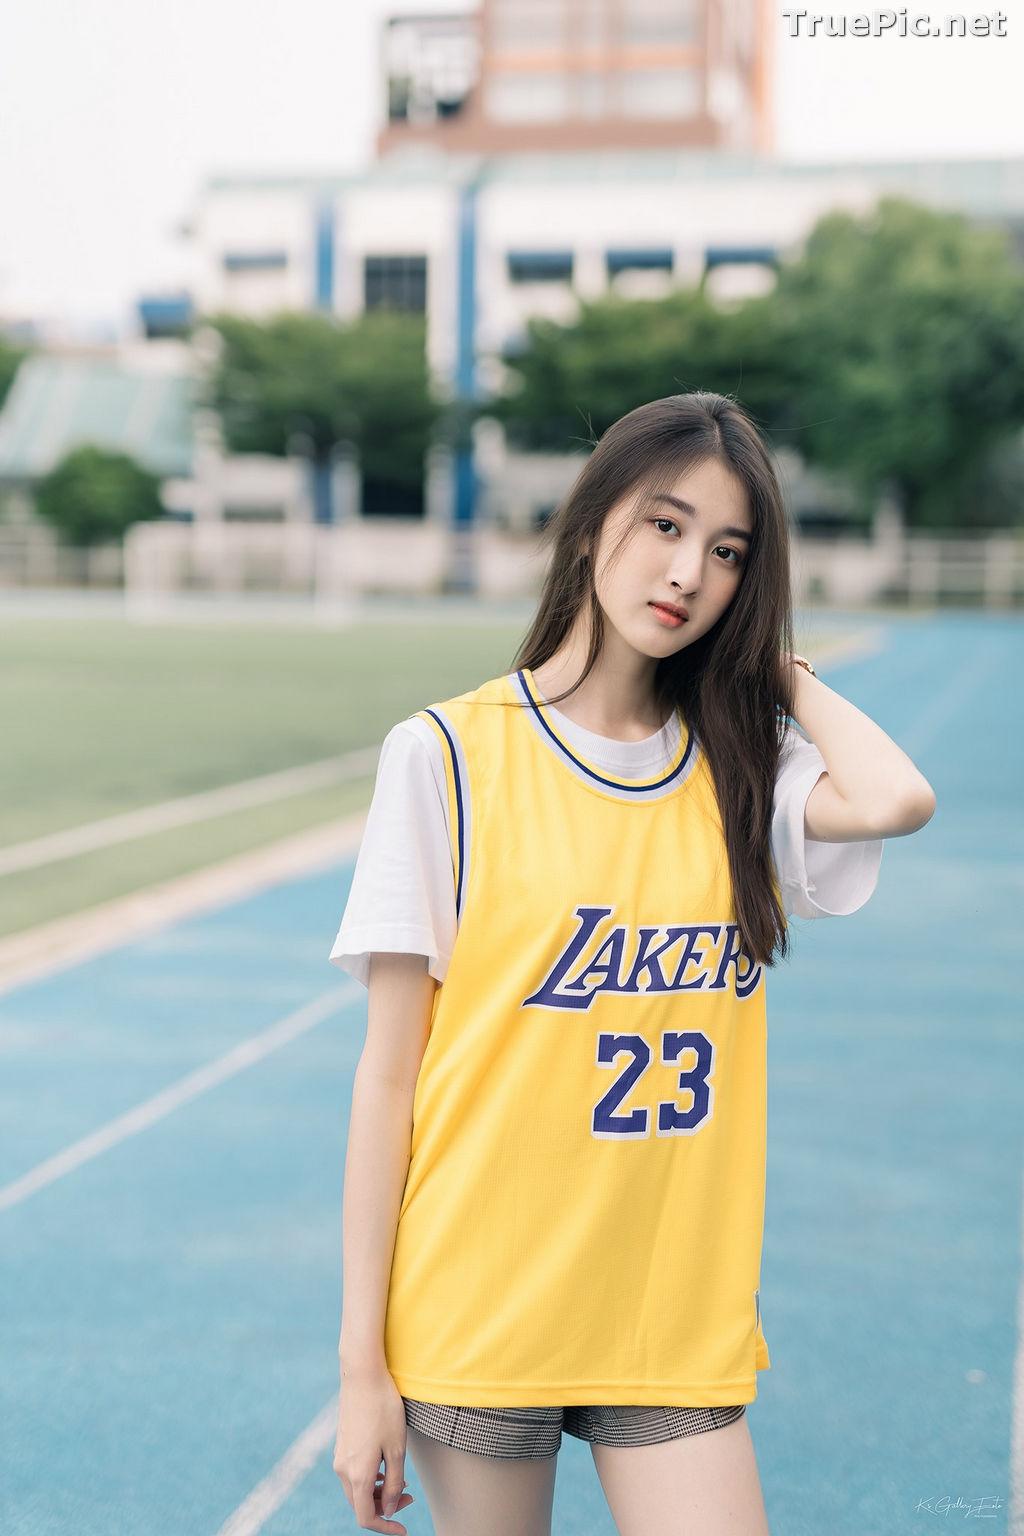 Image Thailand Beautiful Girl - View Benyapa - Long Hair Sport Girl - TruePic.net - Picture-2